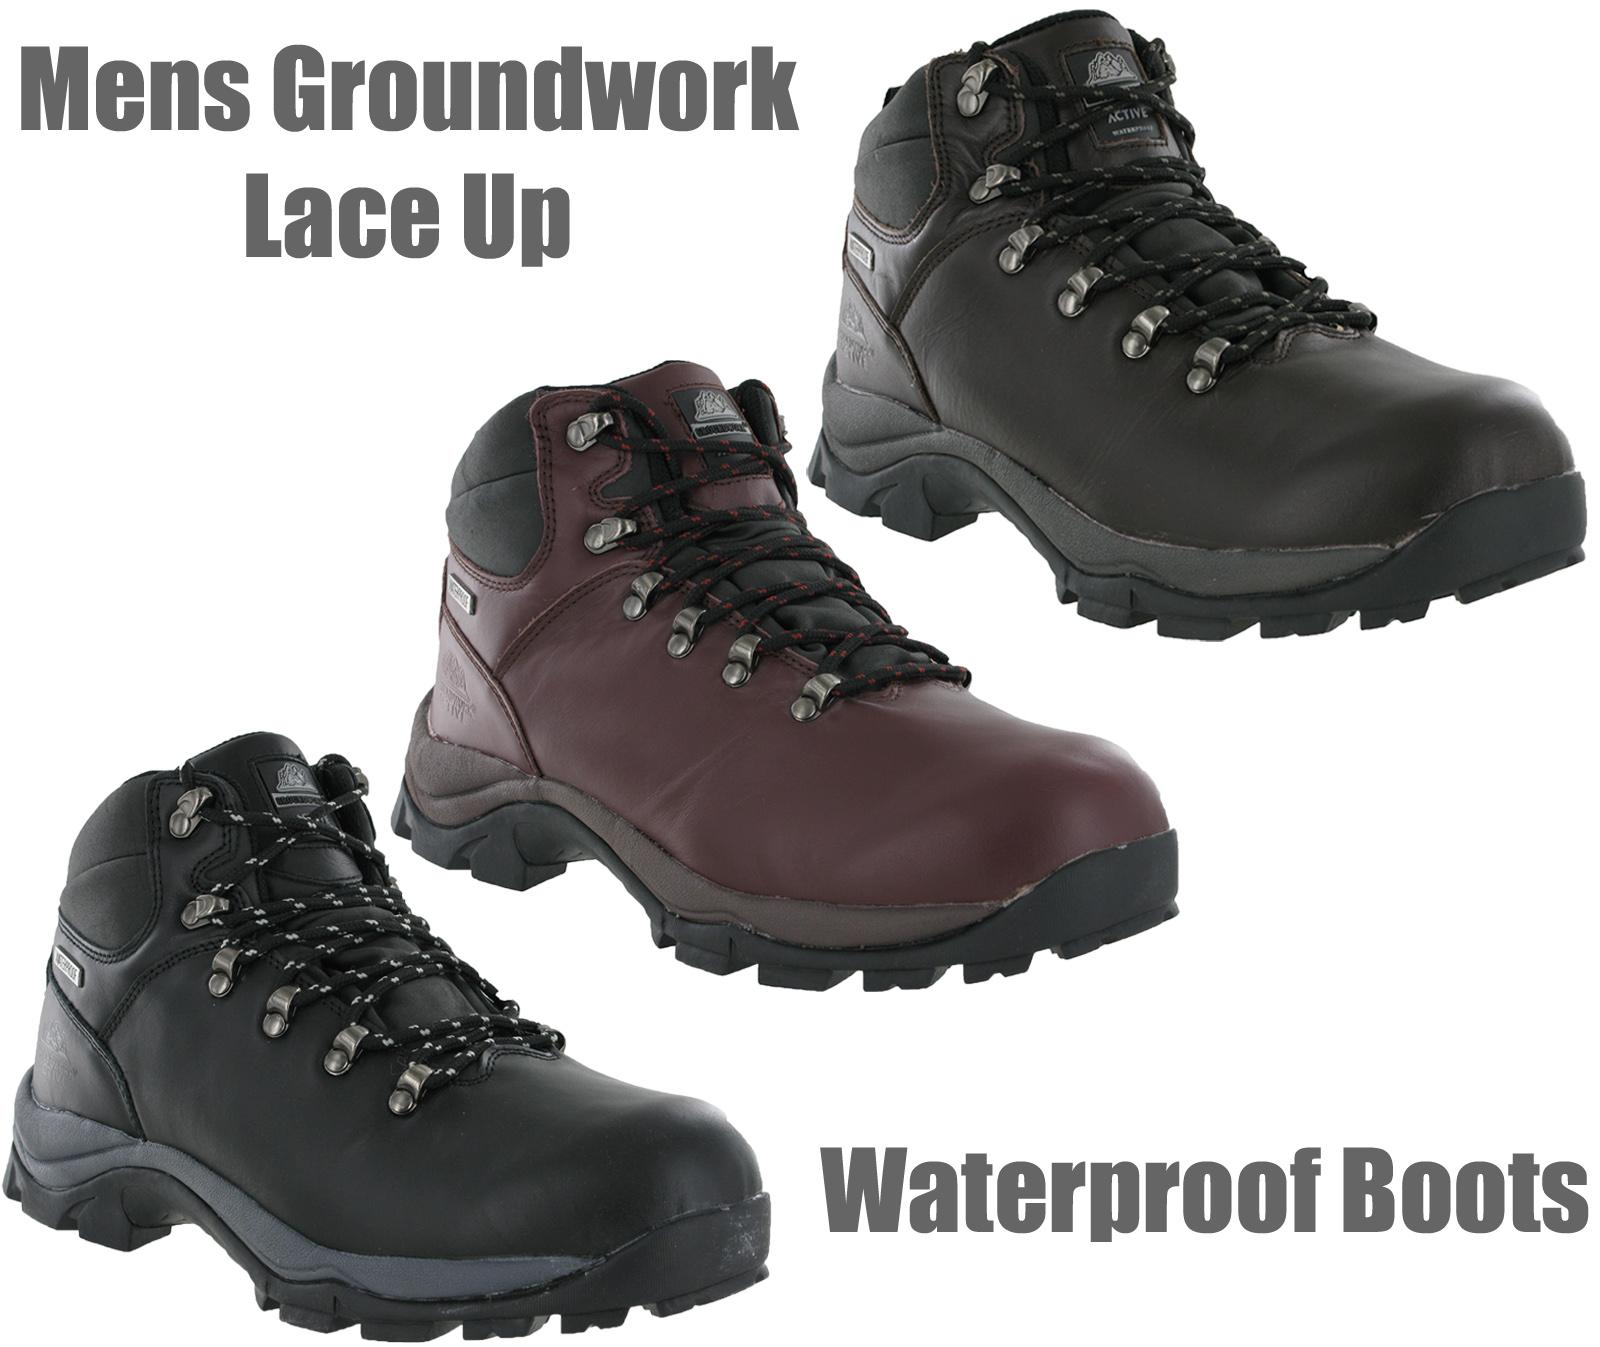 new mens waterproof grain leather trail walking